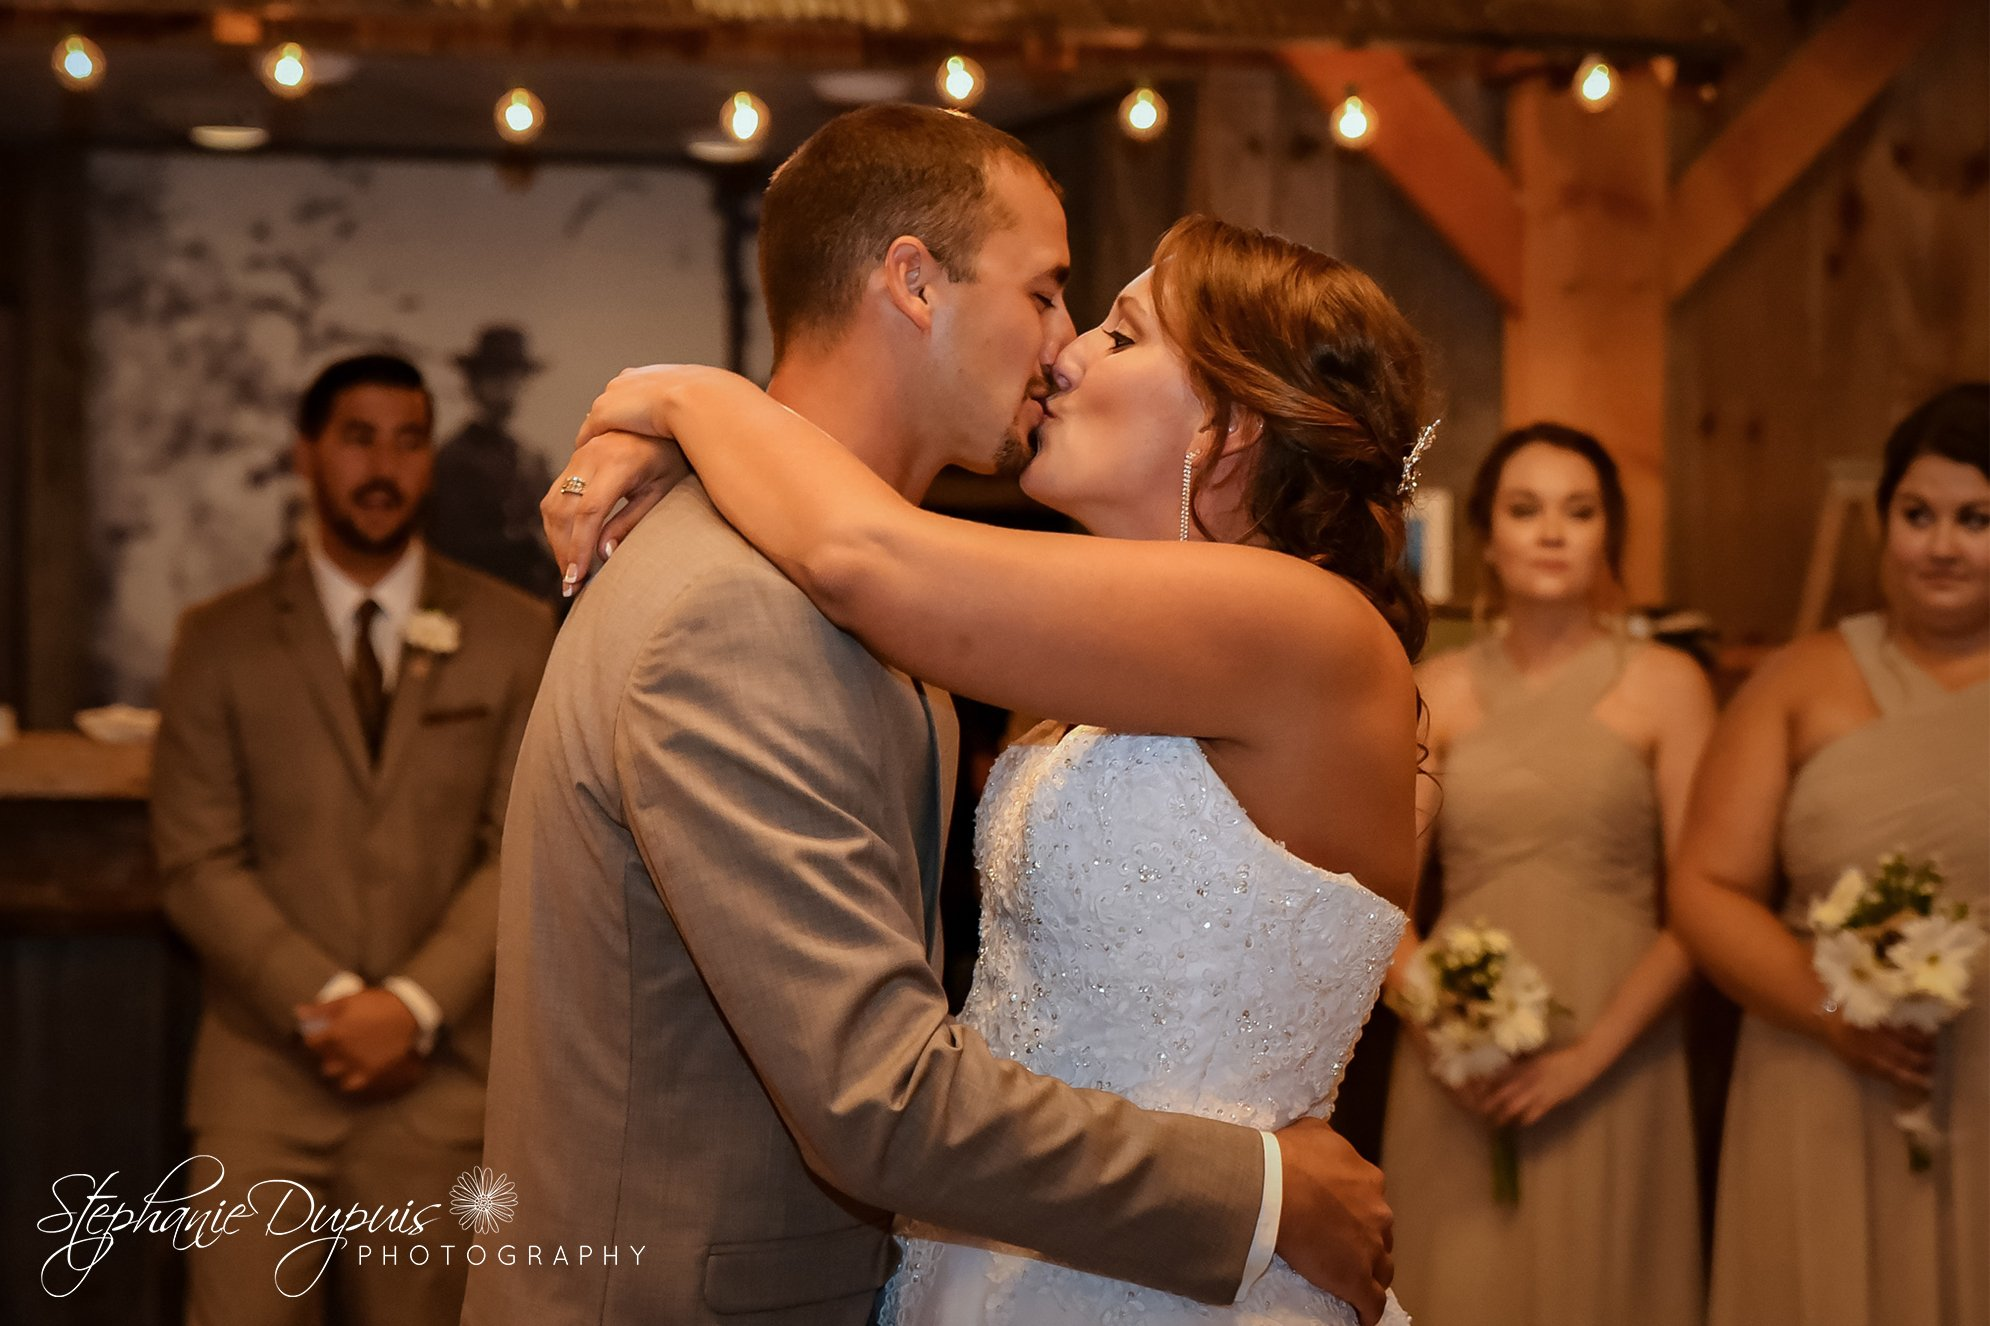 Whitefield Wedding Photographer 01 4 - Portfolio: Nason Wedding